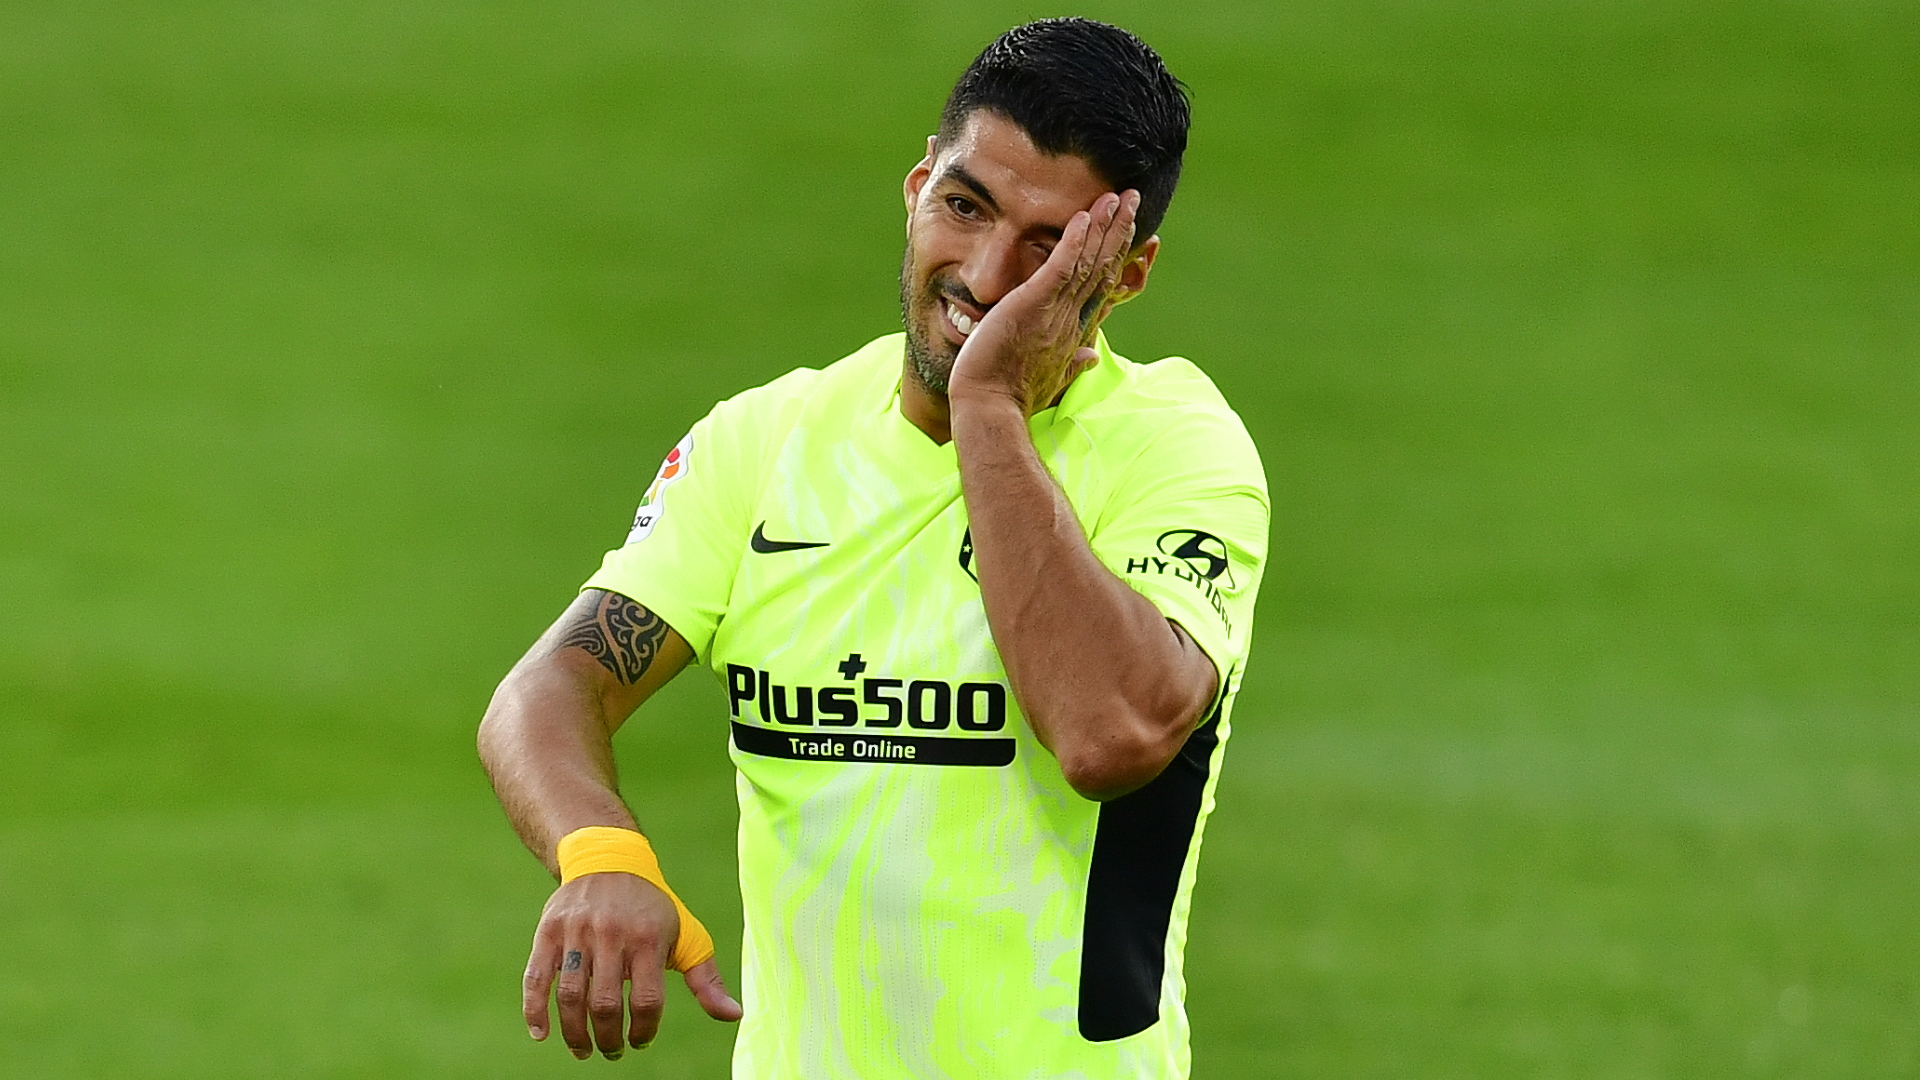 How I cried over treatment at Barcelona - Suarez